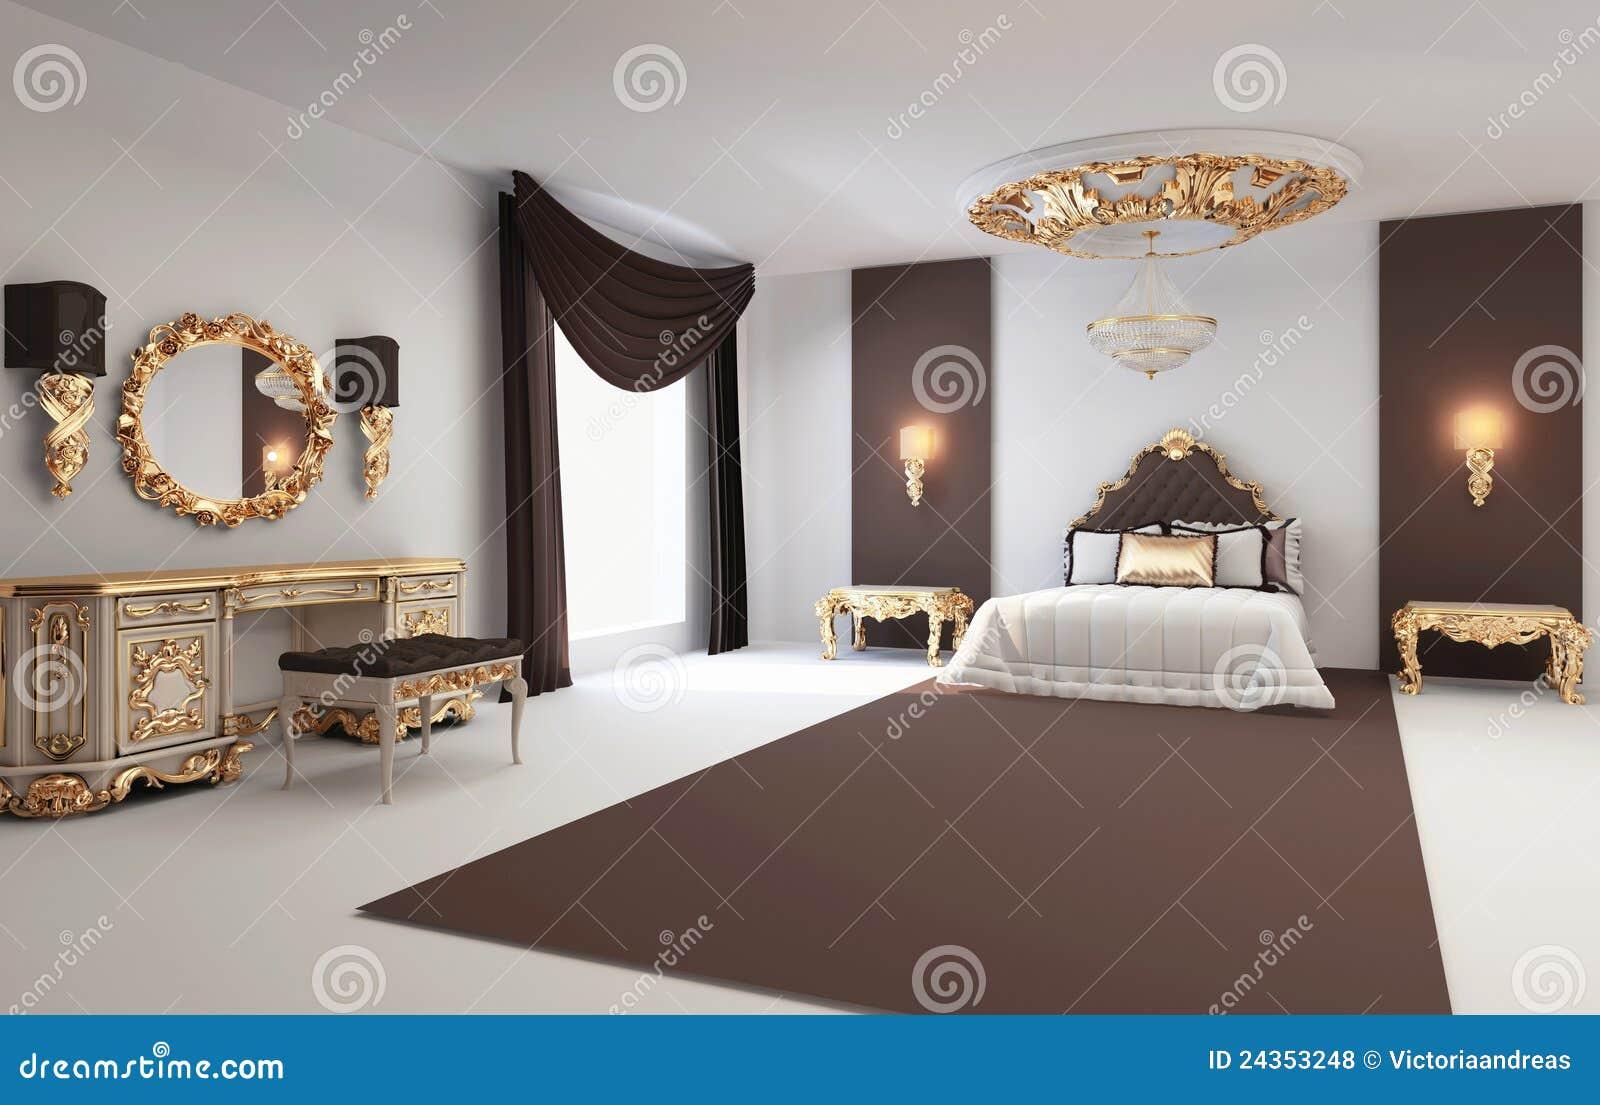 Meuble De Luxe Amazing Reserver Visiter En Image Appartement Meubl